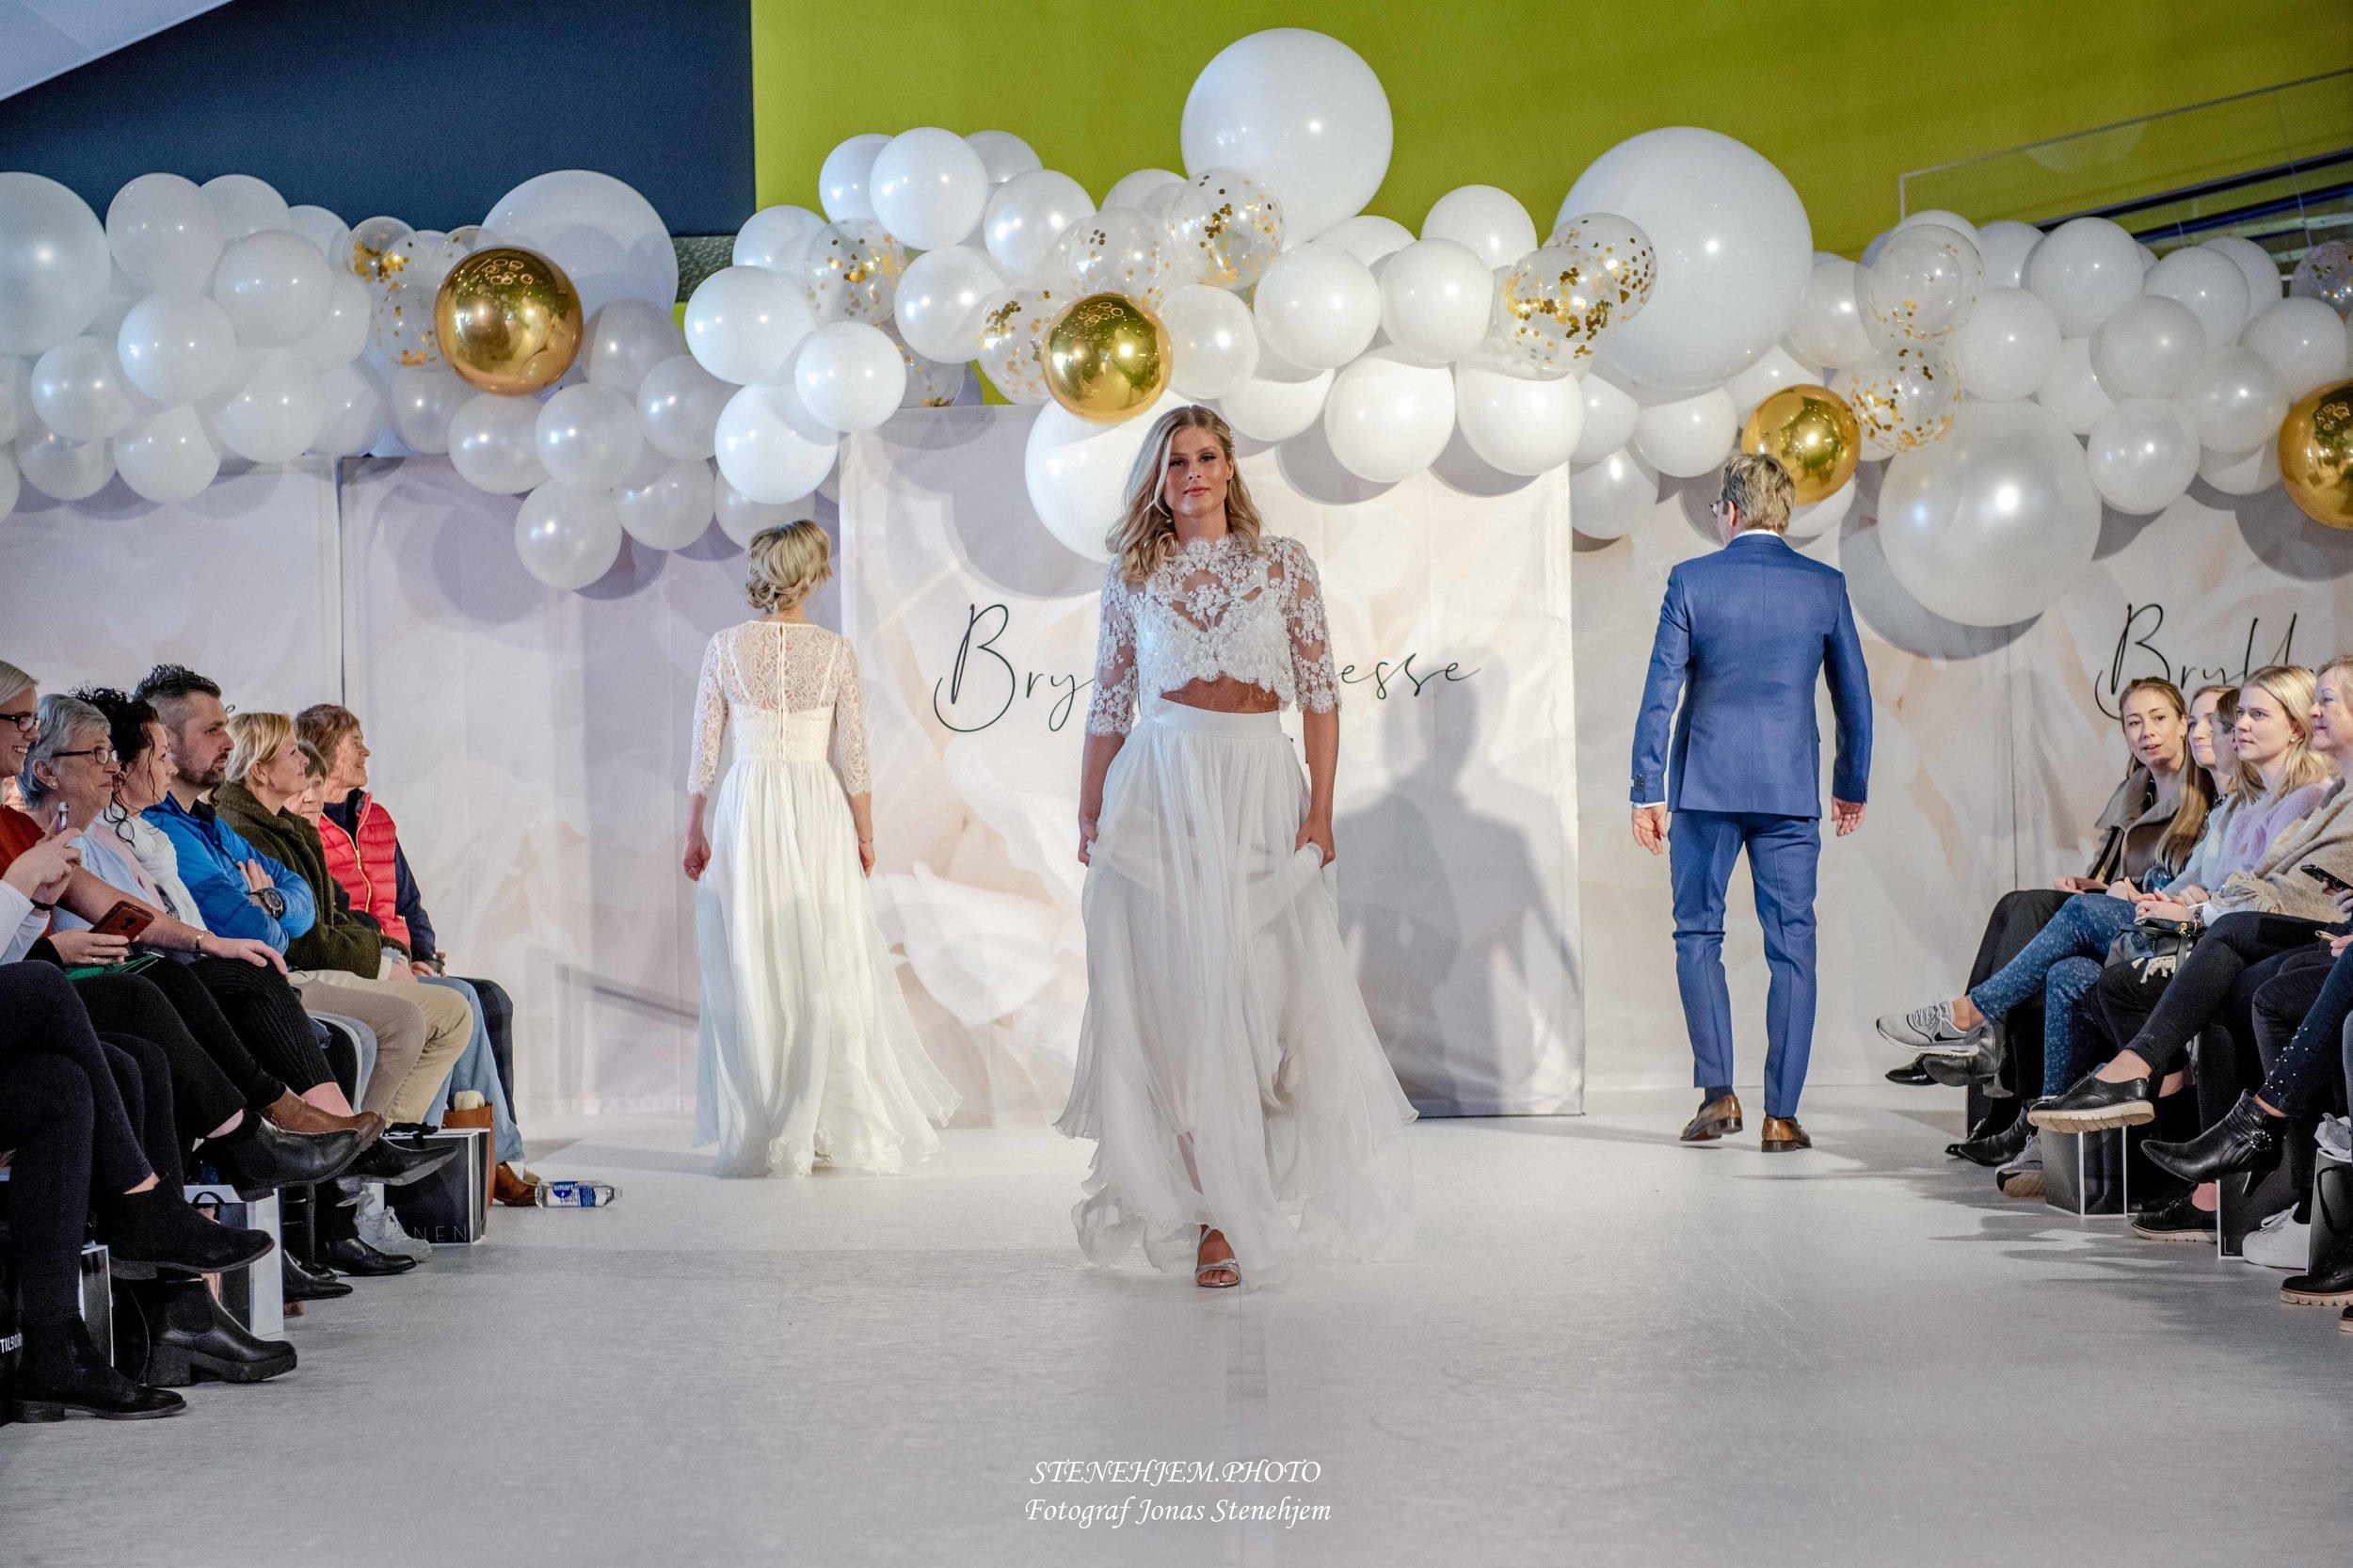 Bryllupsmesse_Lagunen_mittaltweddingfair__047.jpg